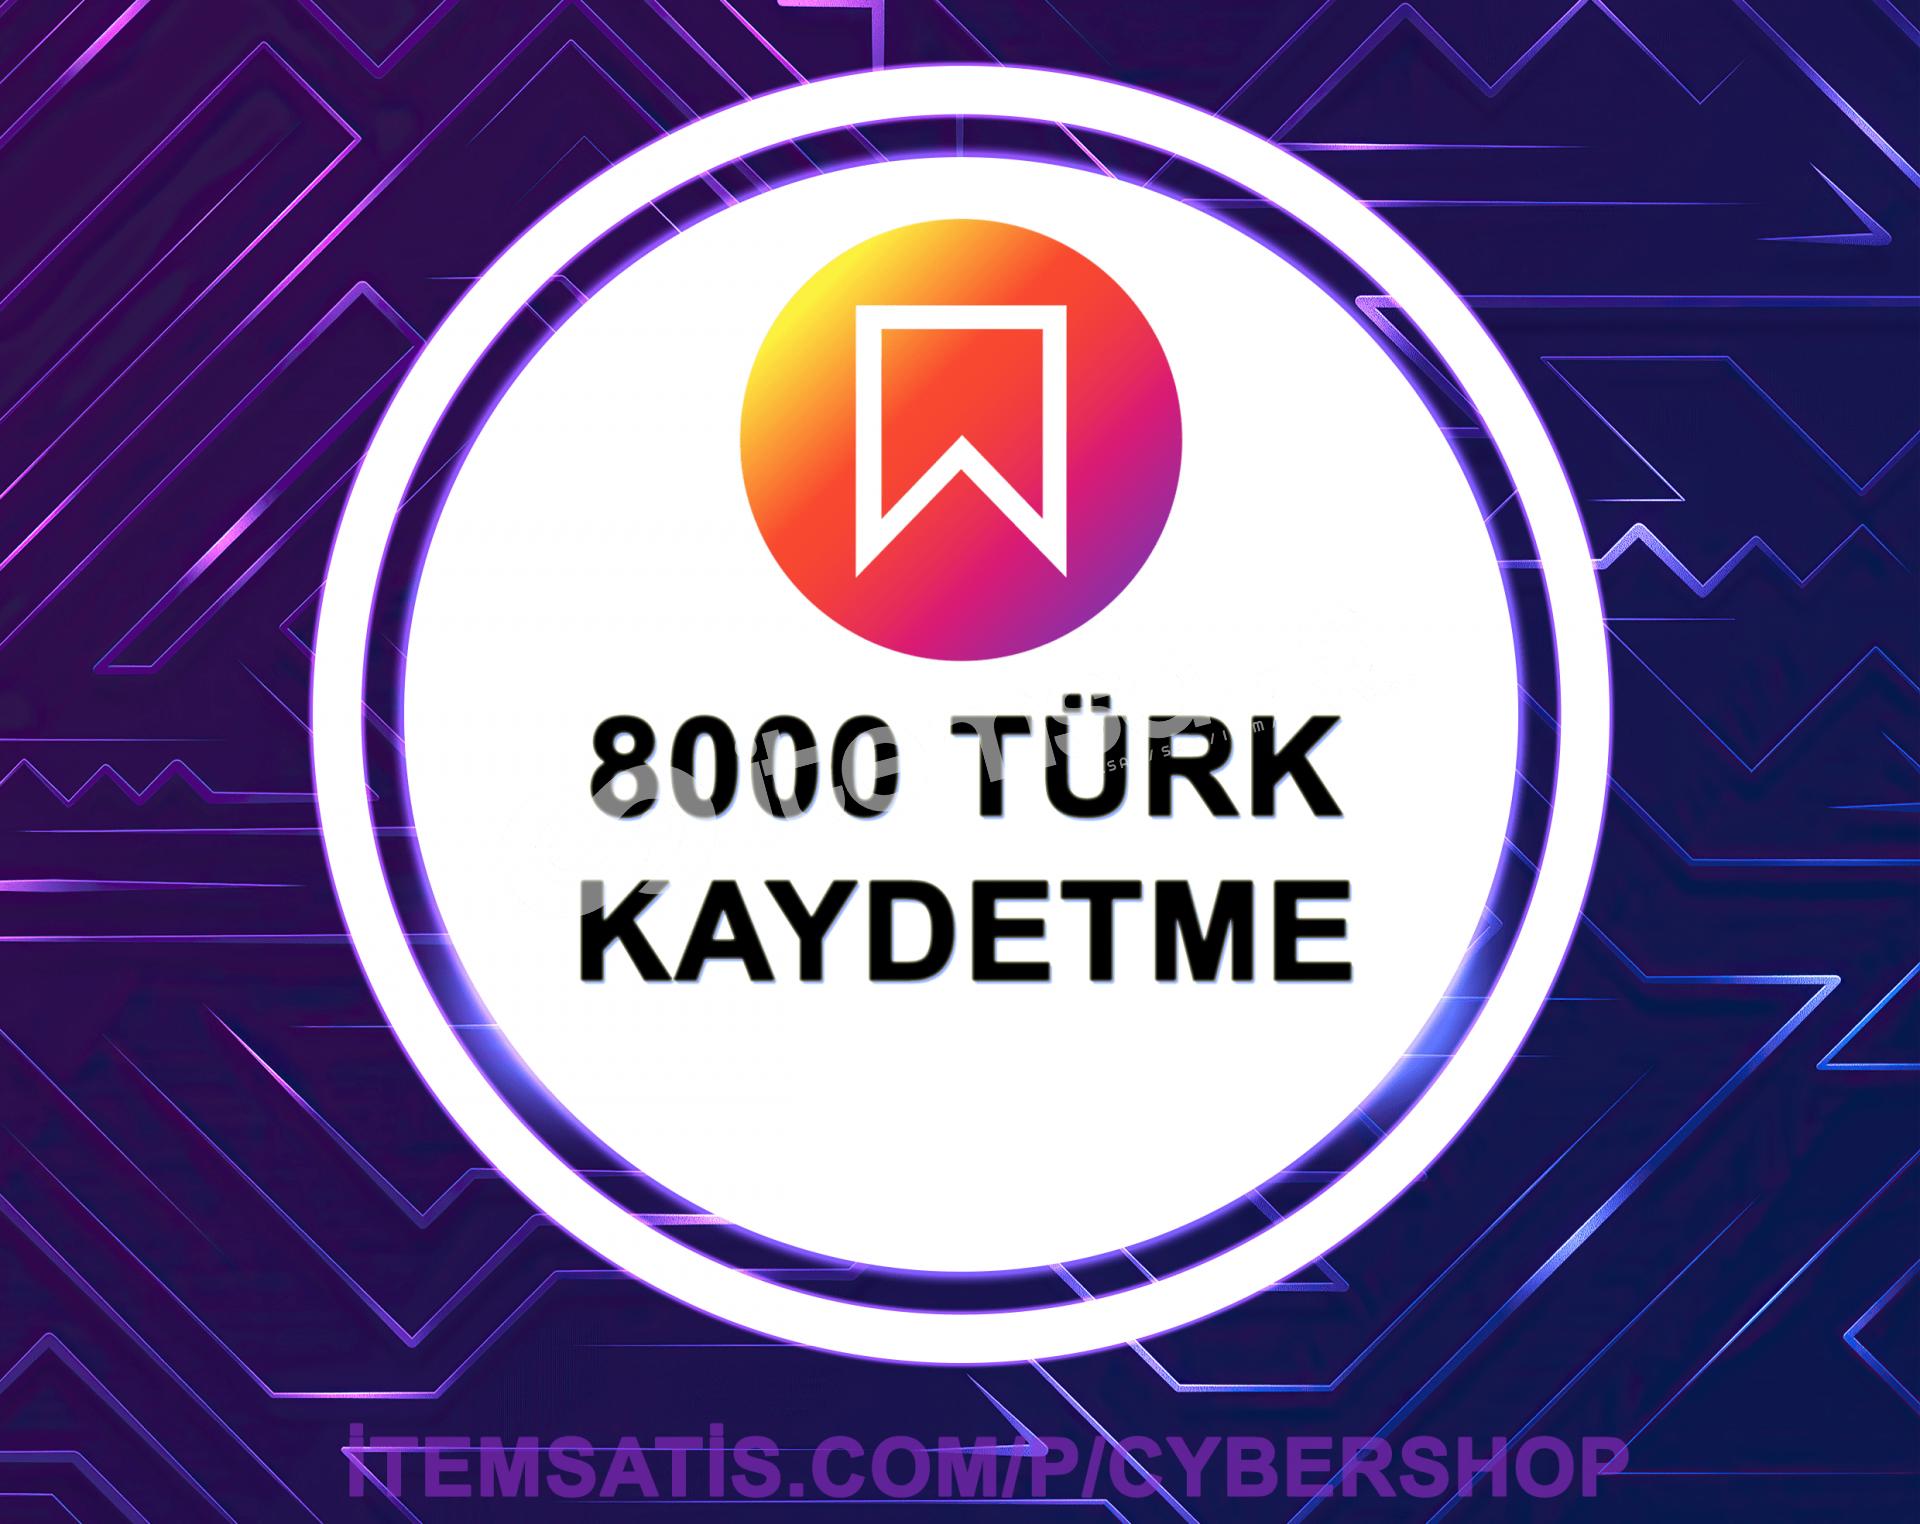 8.000 [TÜRK] Kaydetme Paketi